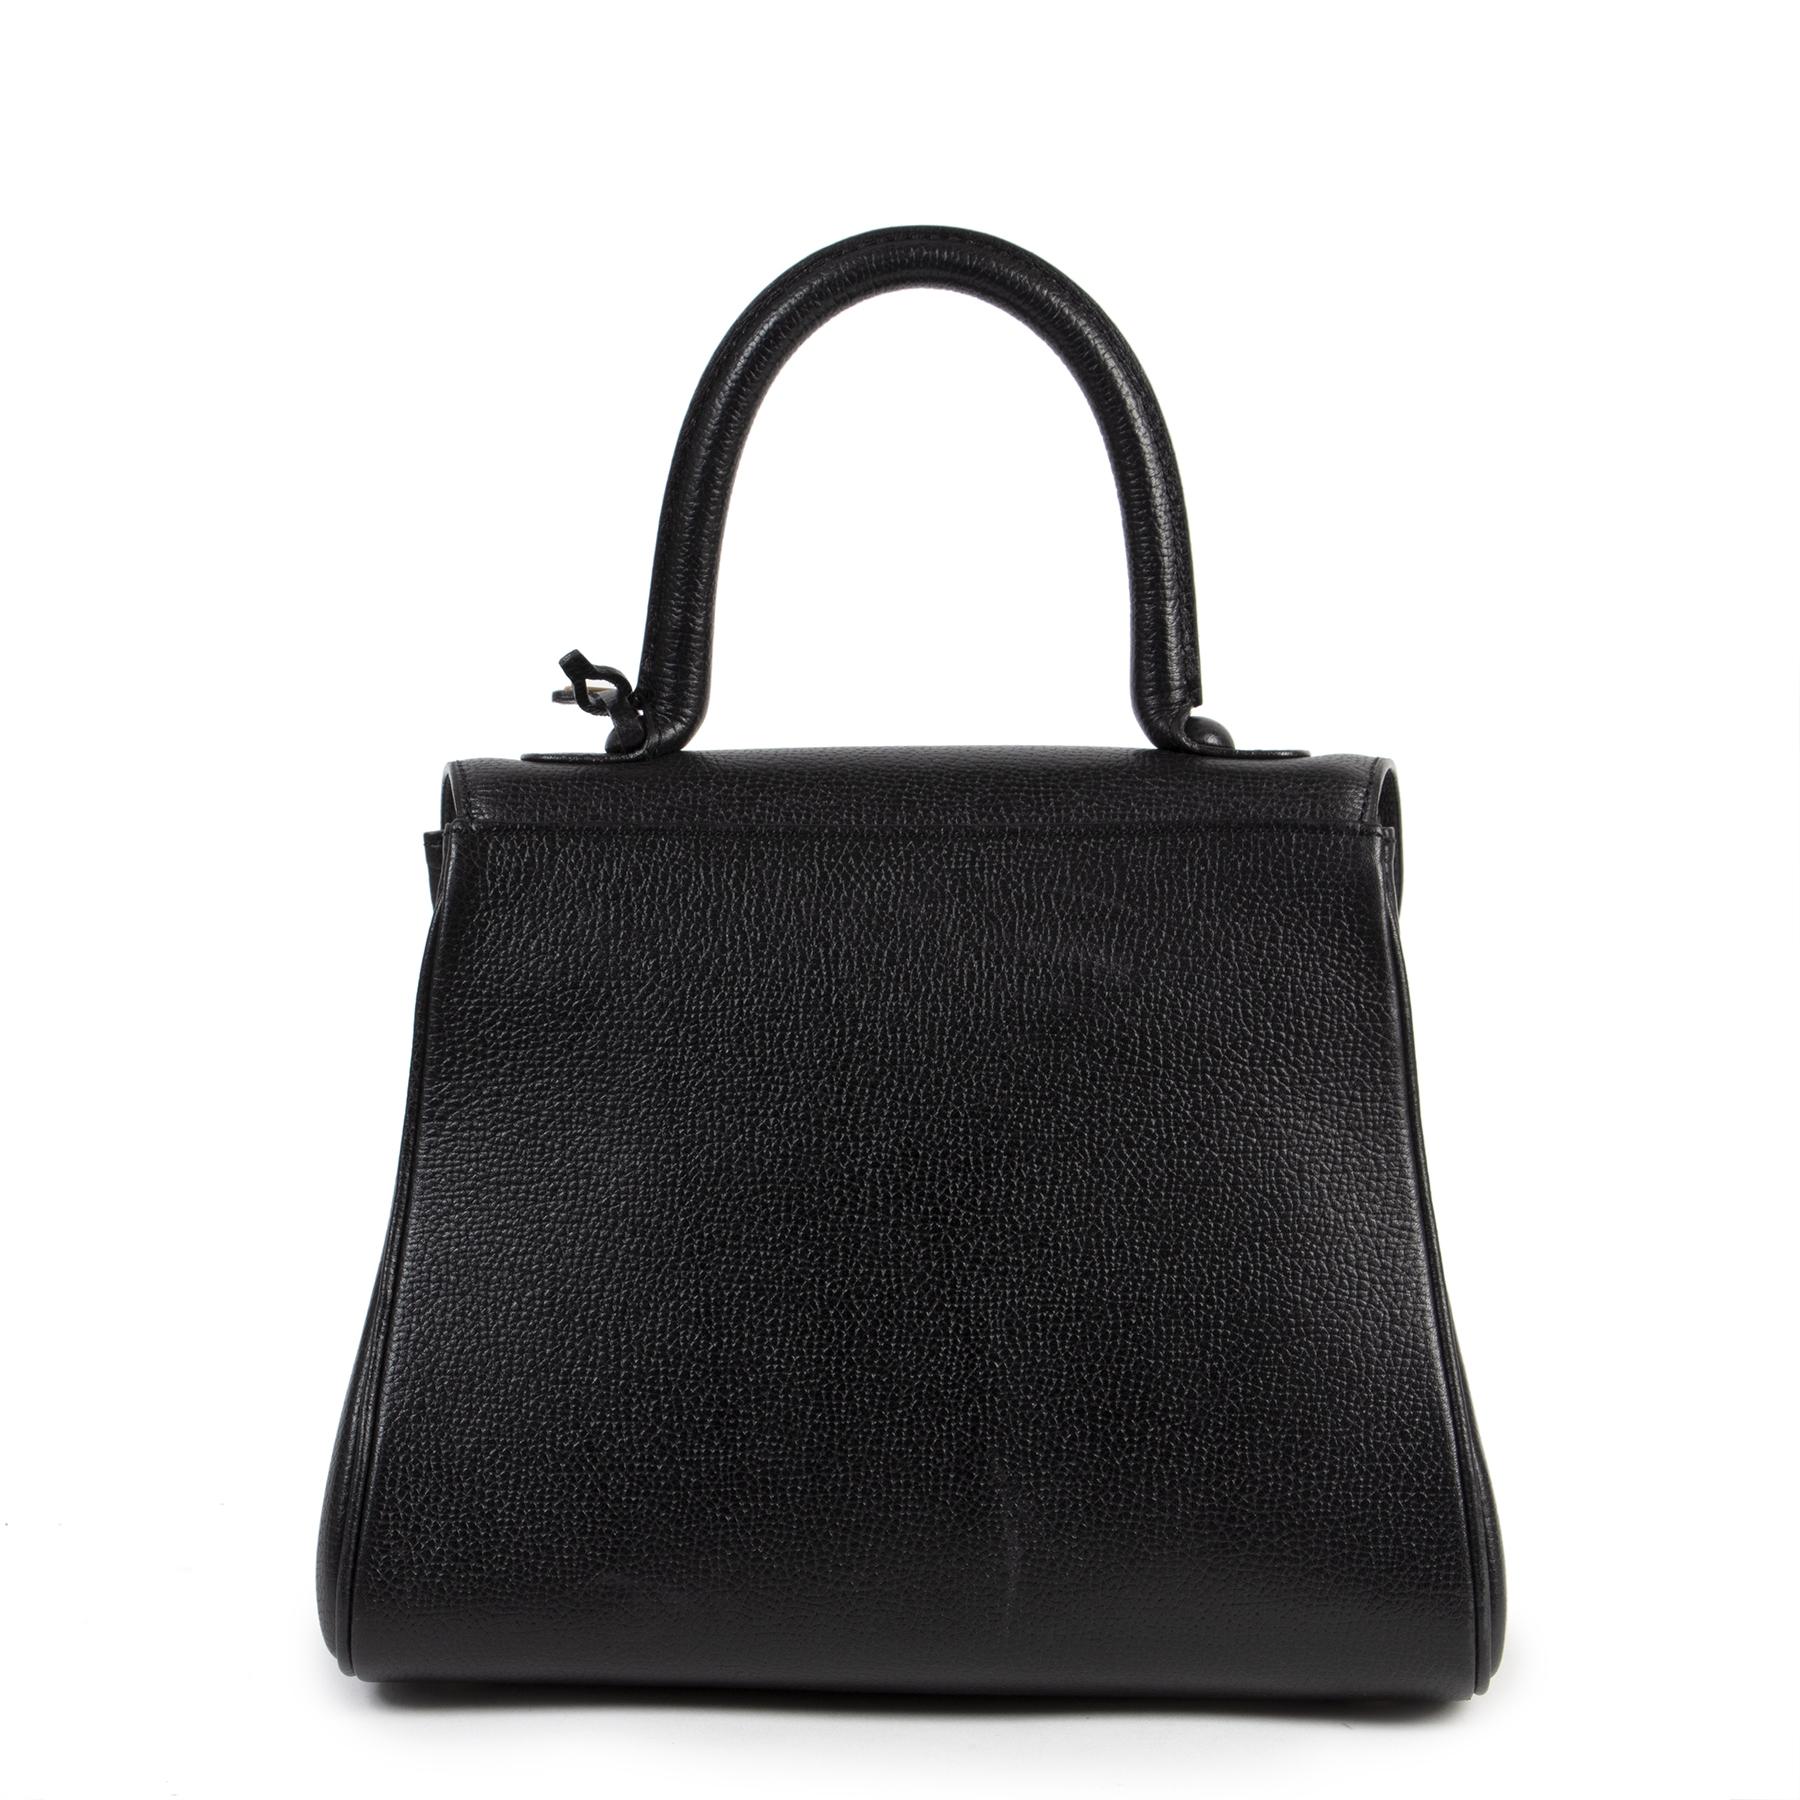 Authentieke tweedehands vintage Delvaux Black Brillant PM Bag koop online webshop LabelLOV